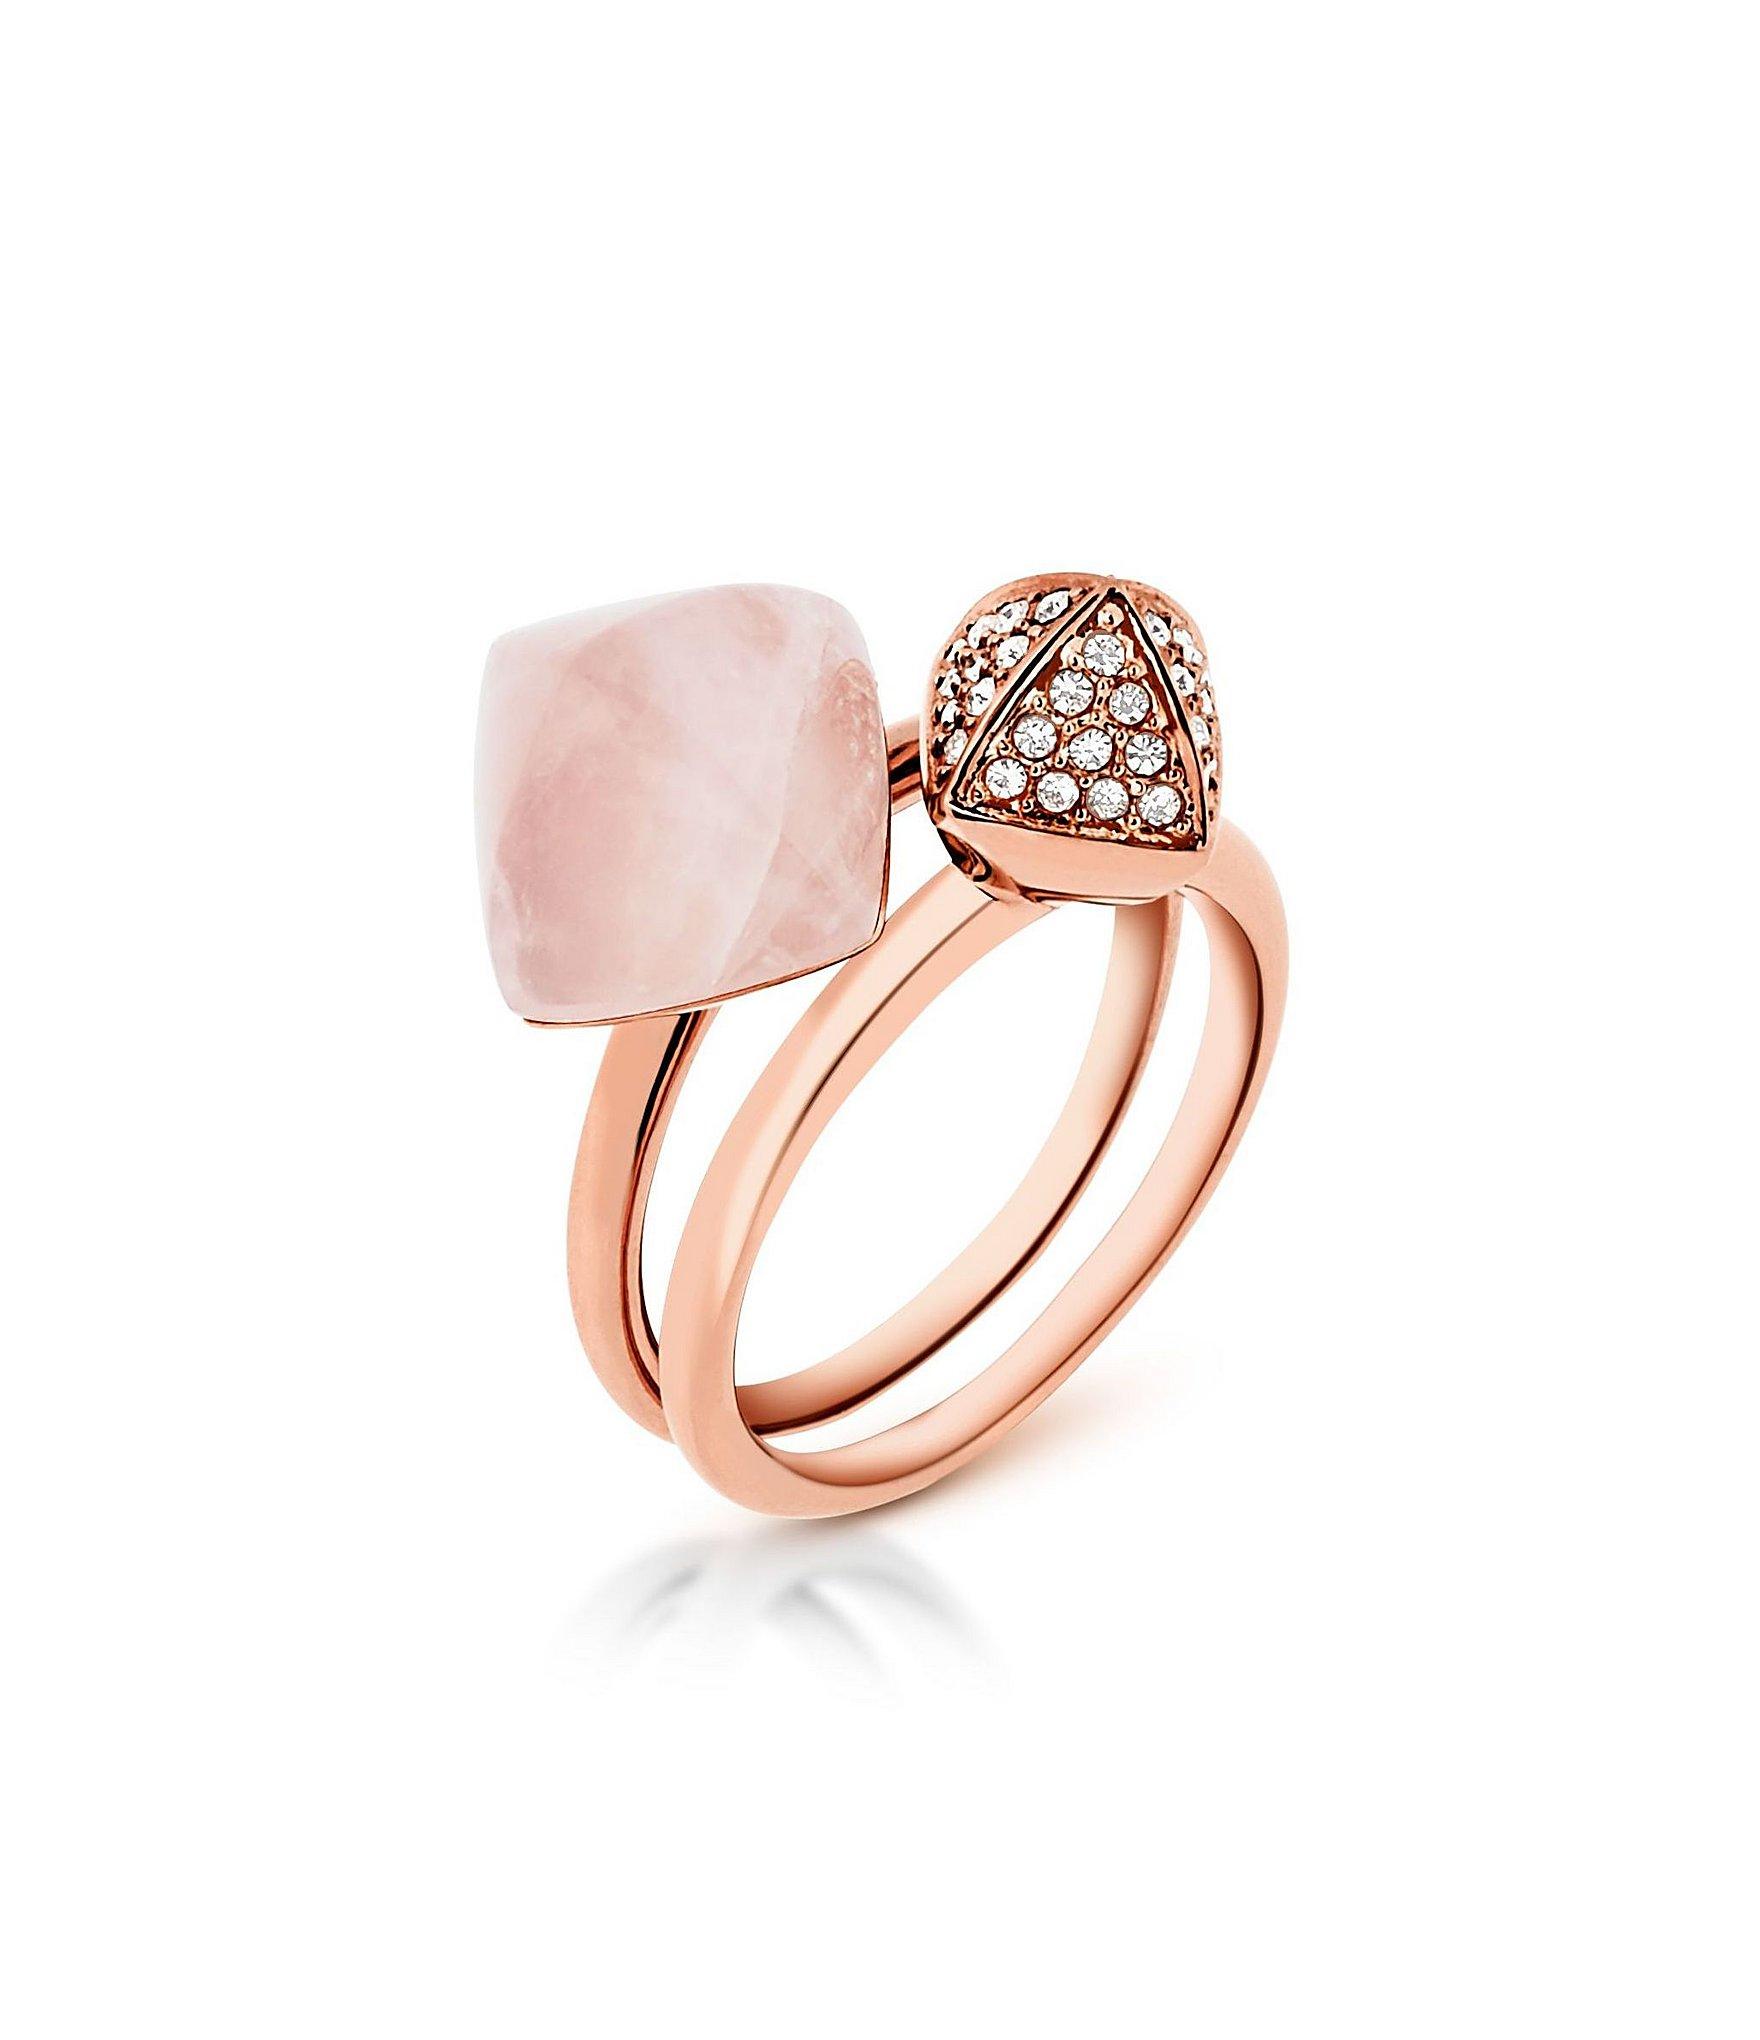 Michael kors Semi precious Rose Quartz Stone Pyramid Stacked Ring